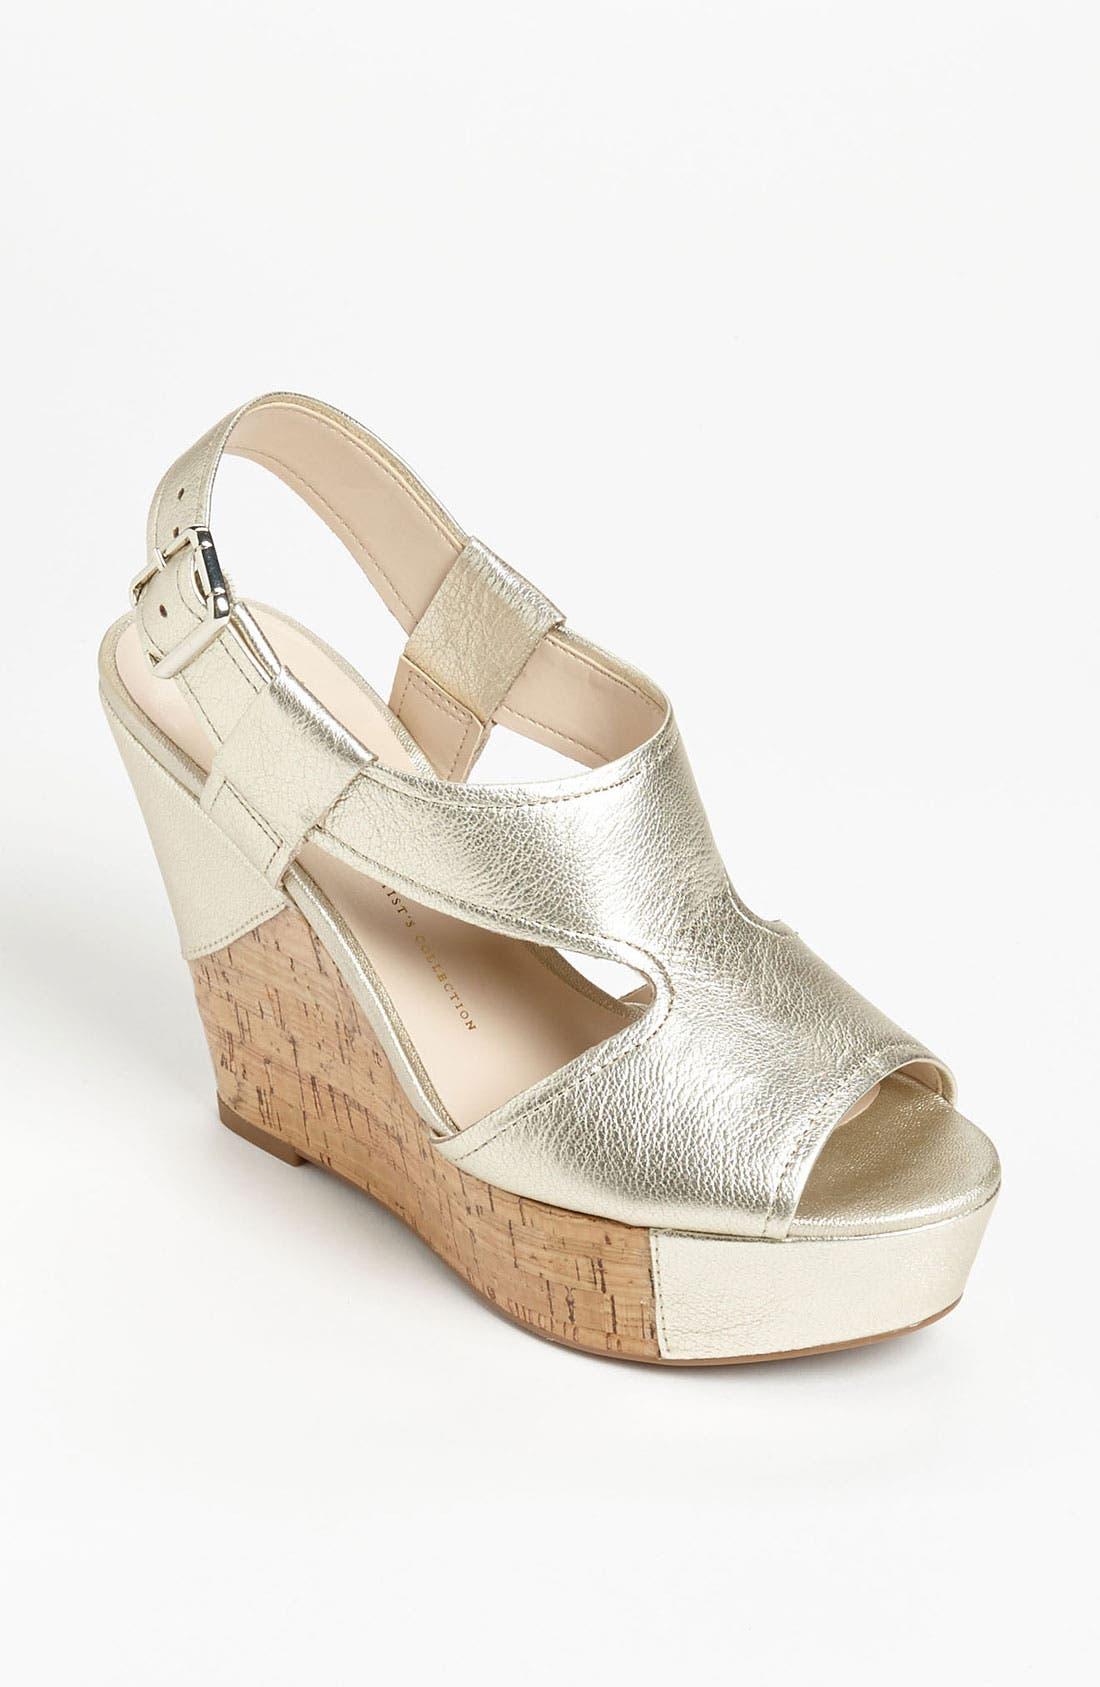 Main Image - Franco Sarto 'Xenon' Wedge Sandal (Special Purchase)